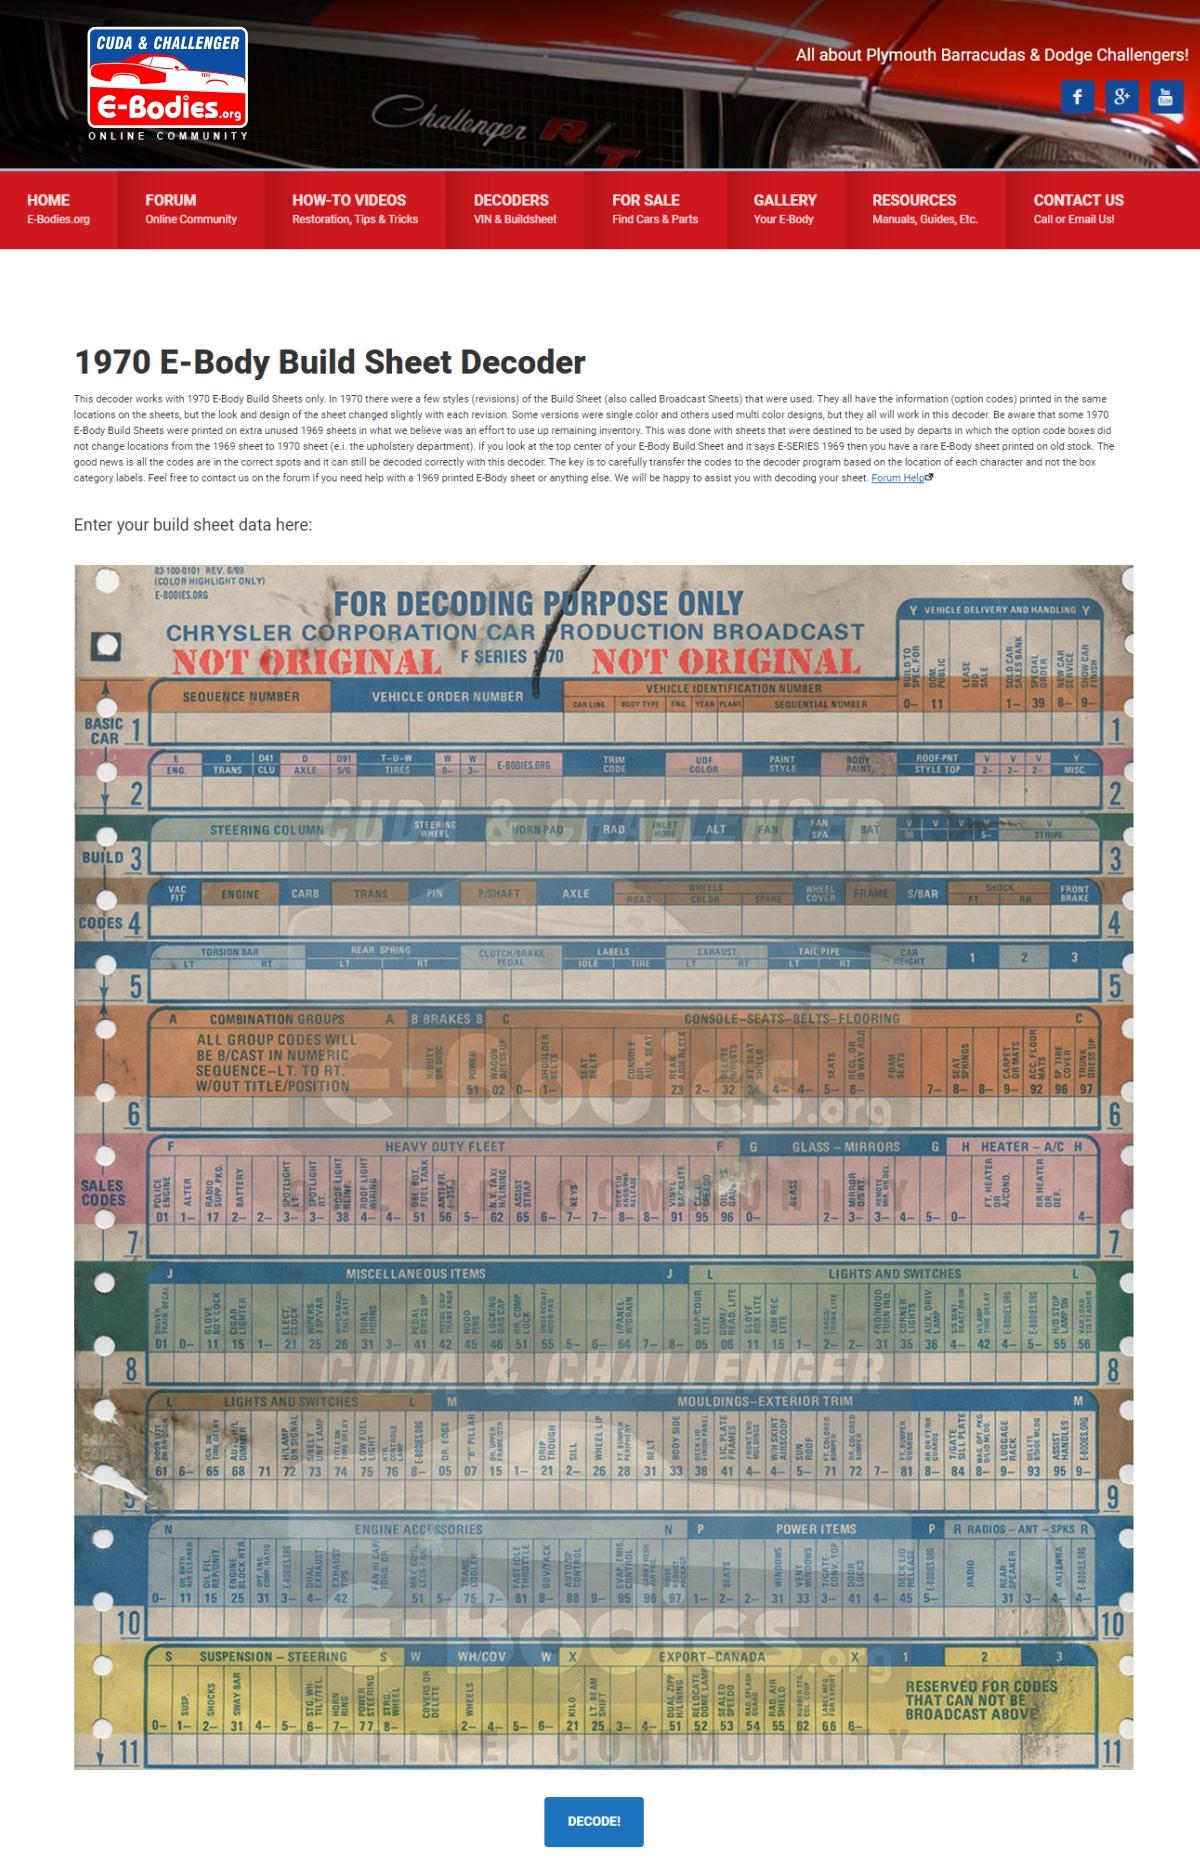 New 1970 online Build Sheet Decoder for E-Bodies  - Moparts